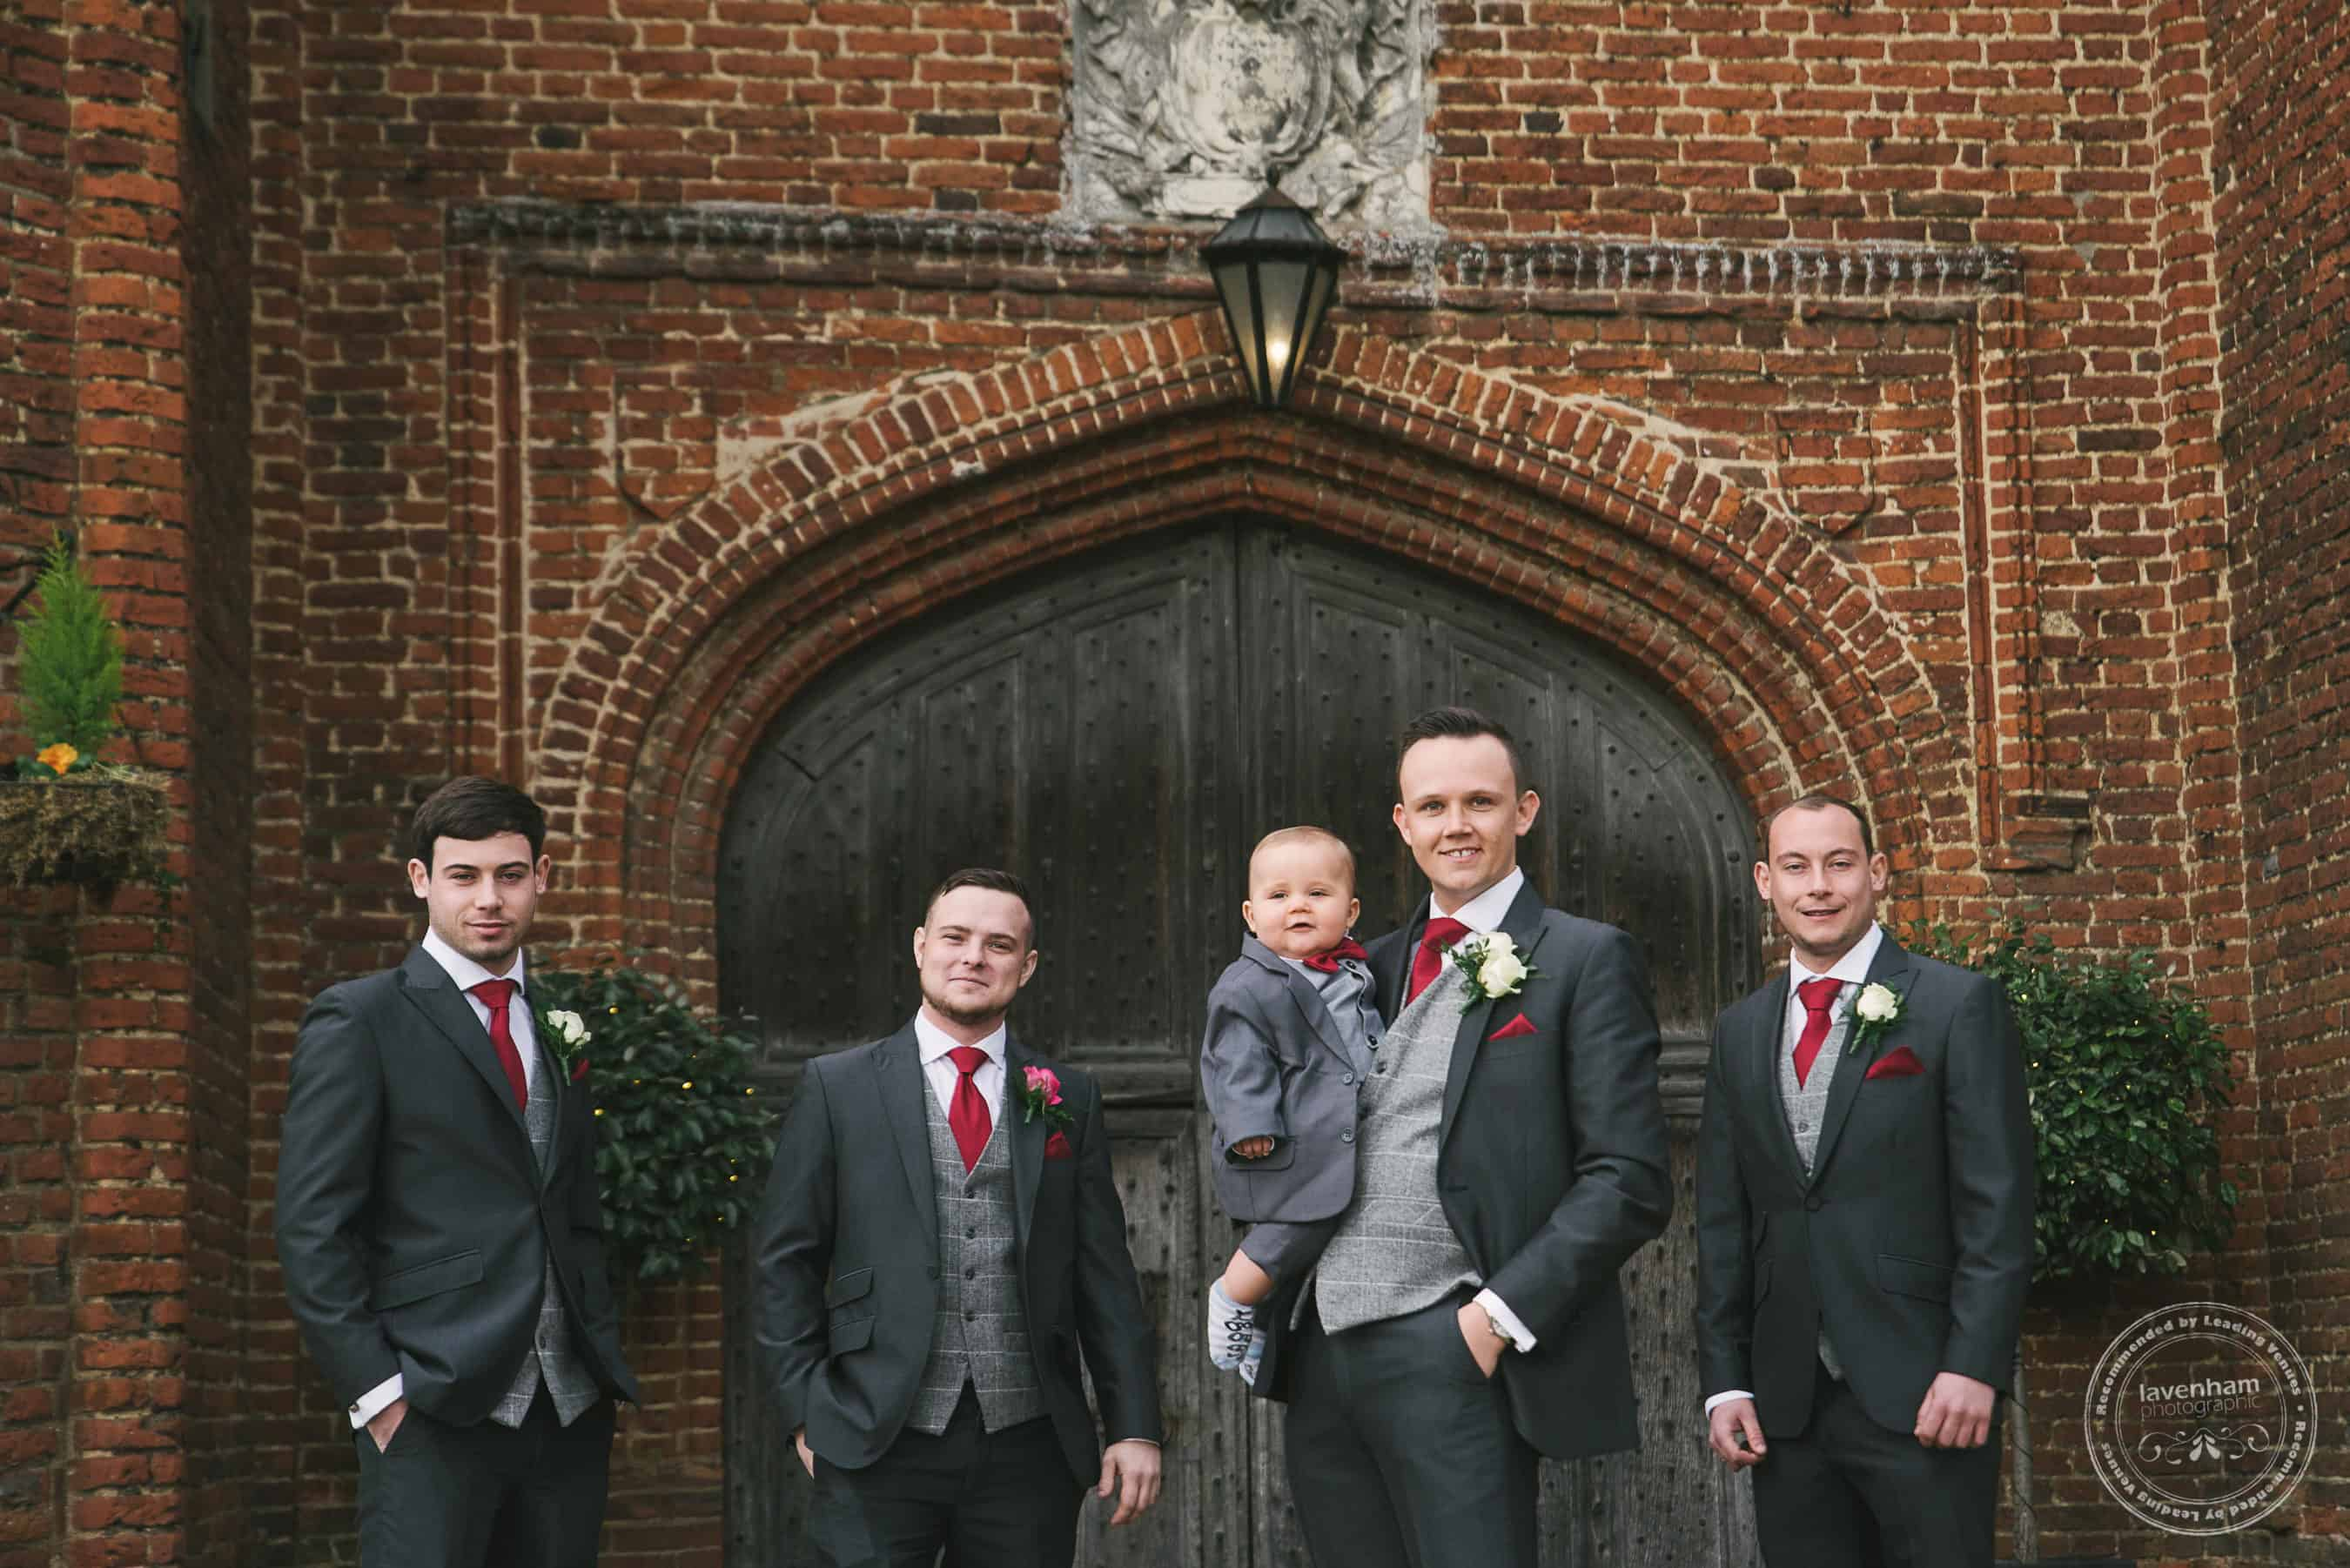 251118 Leez Priory Wedding Photography by Lavenham Photographic 012